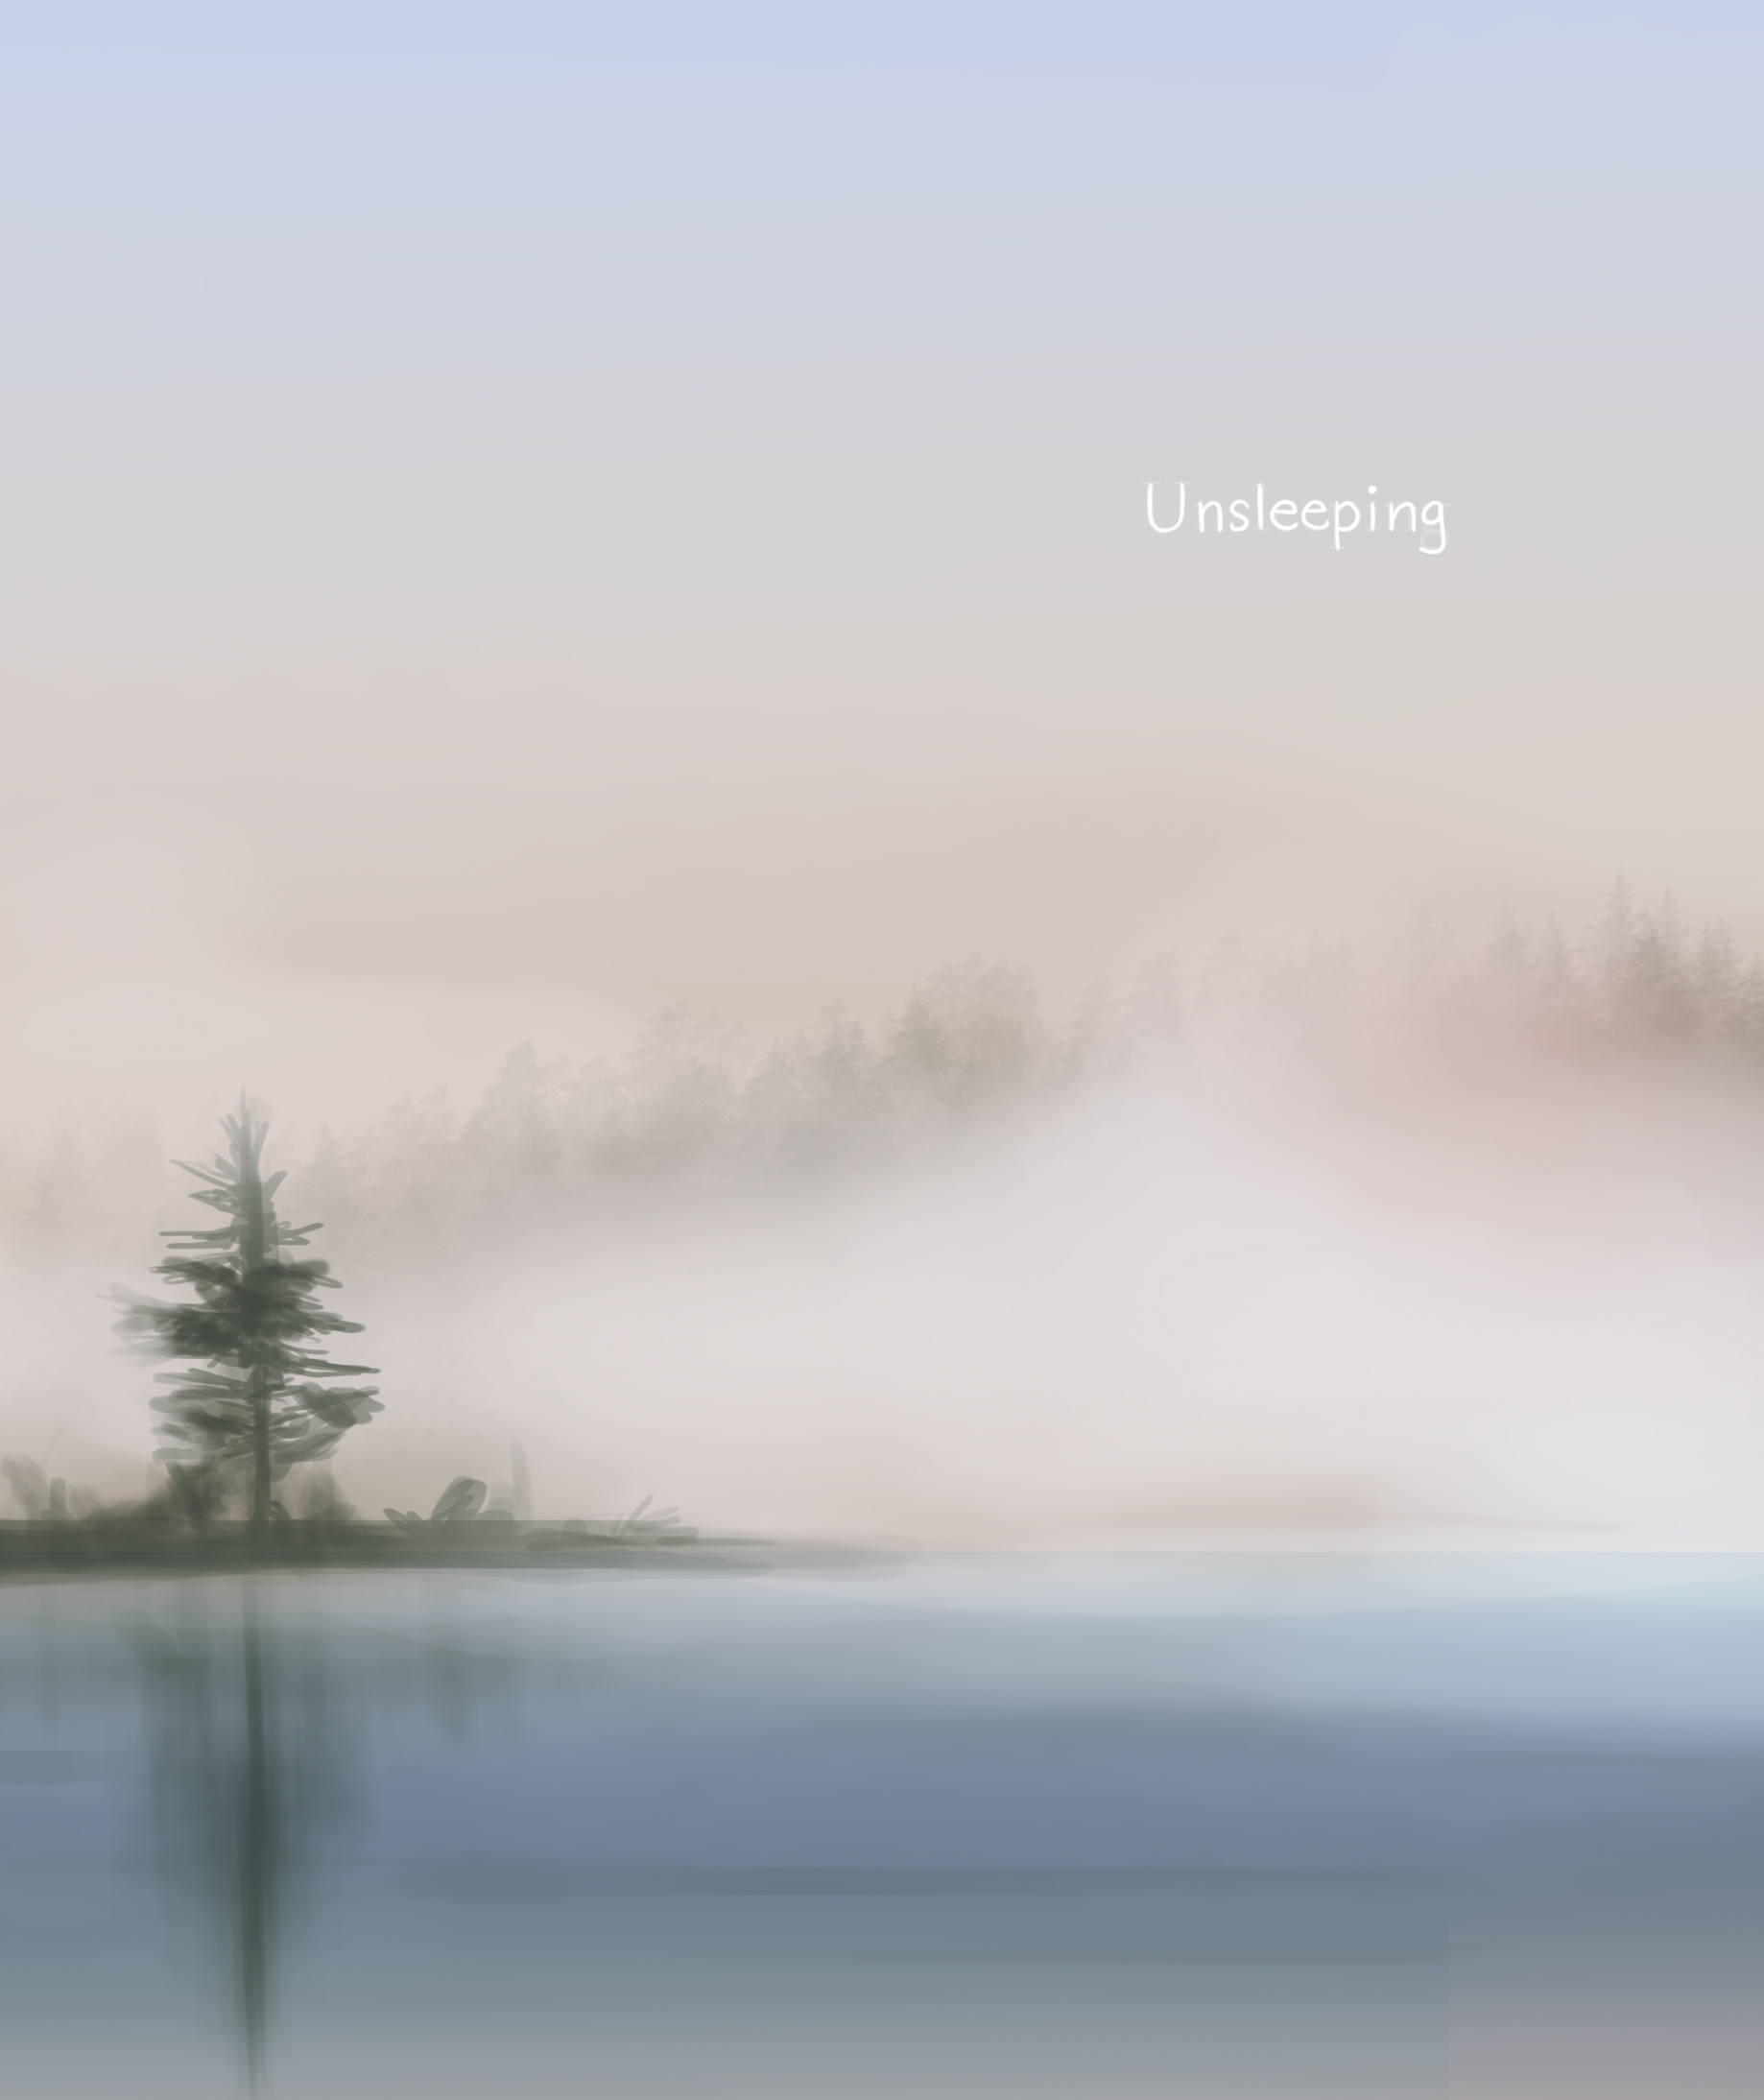 Unsleeping